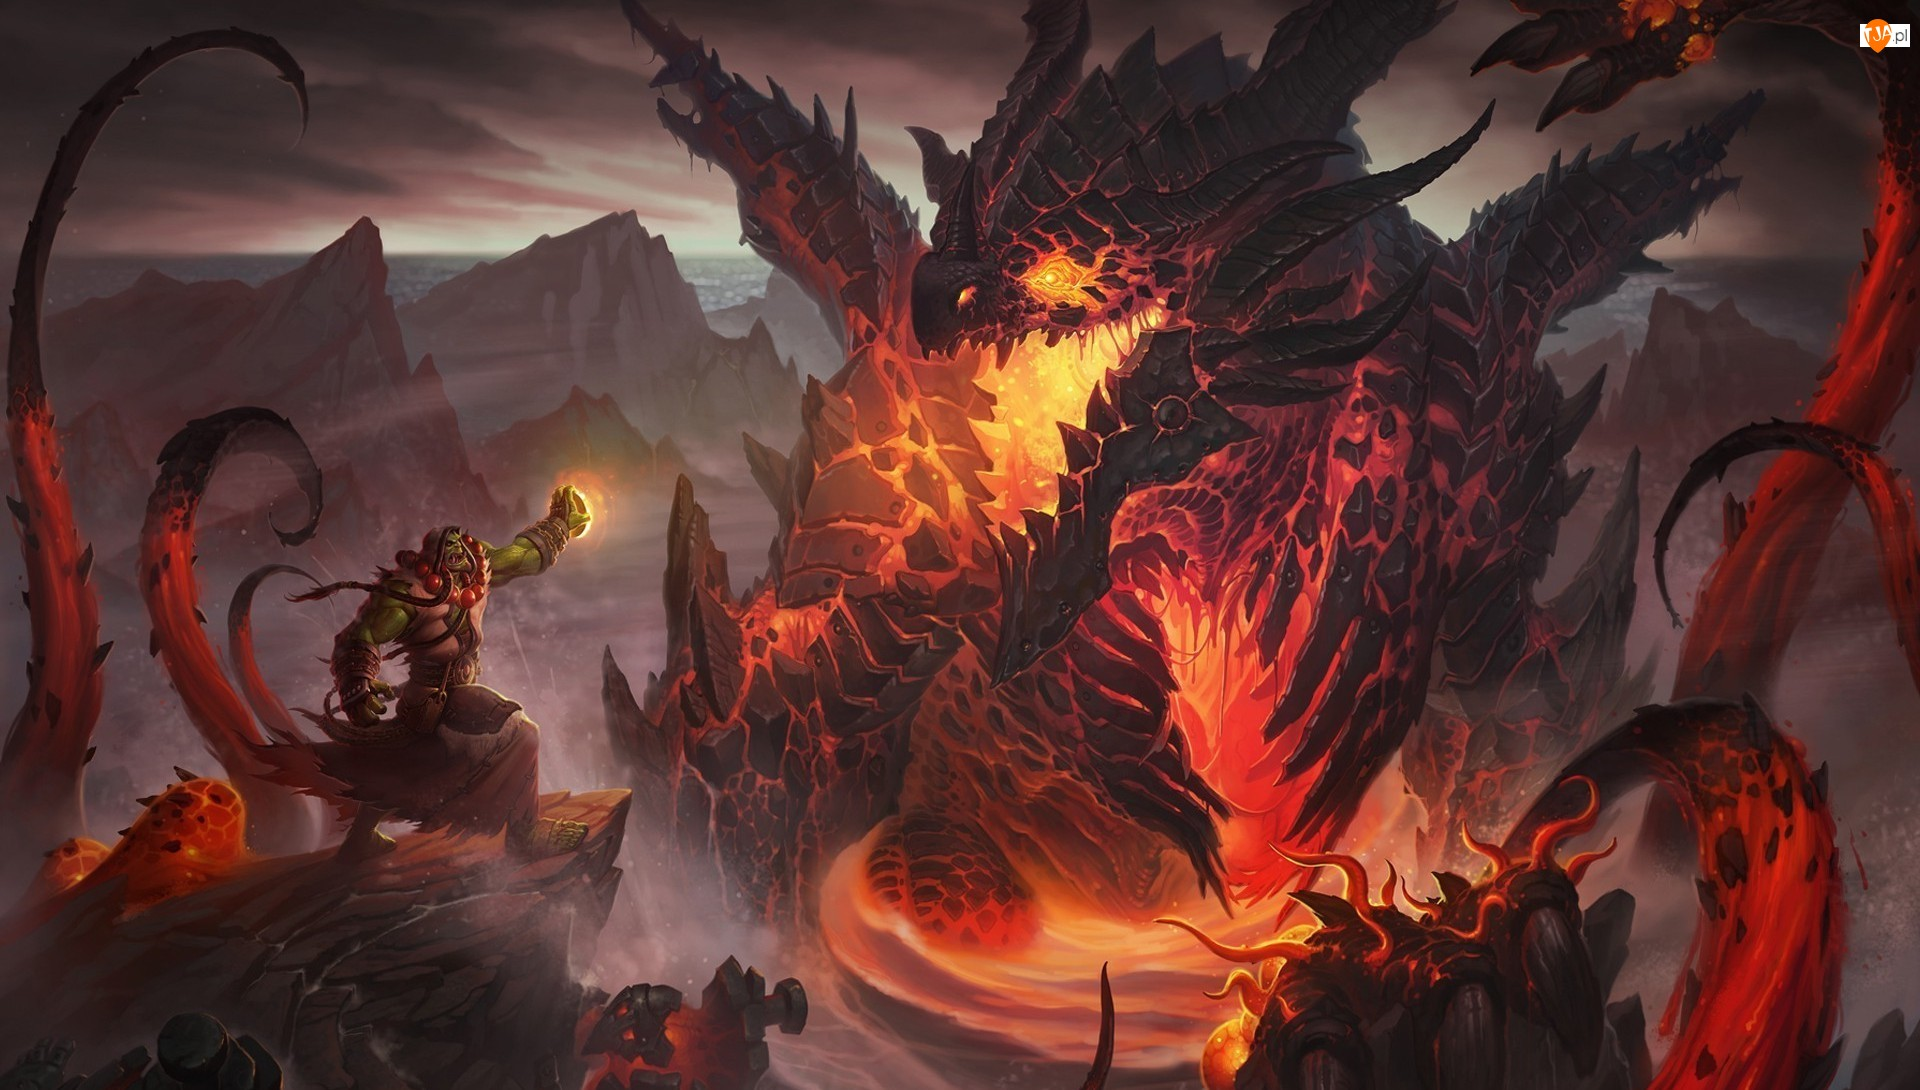 Deathwing, Gra, Postacie, World of Warcraft: Cataclysm, Thrall